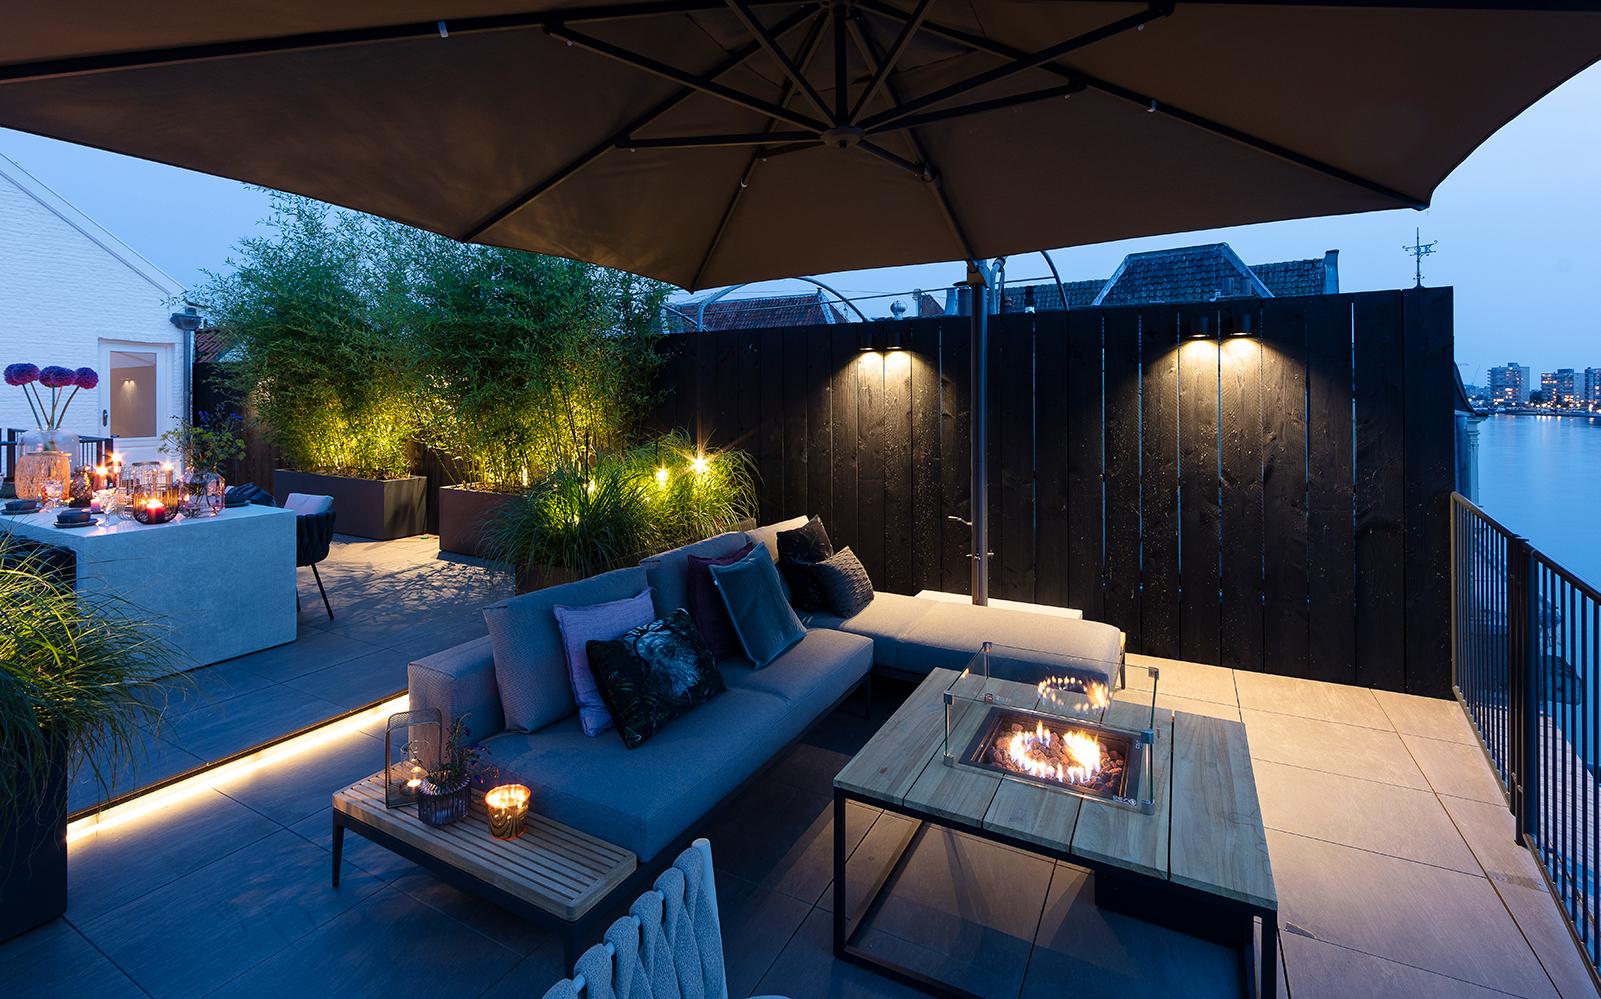 in-lite outdoor lighting, buitenverlichting, avondverlichting